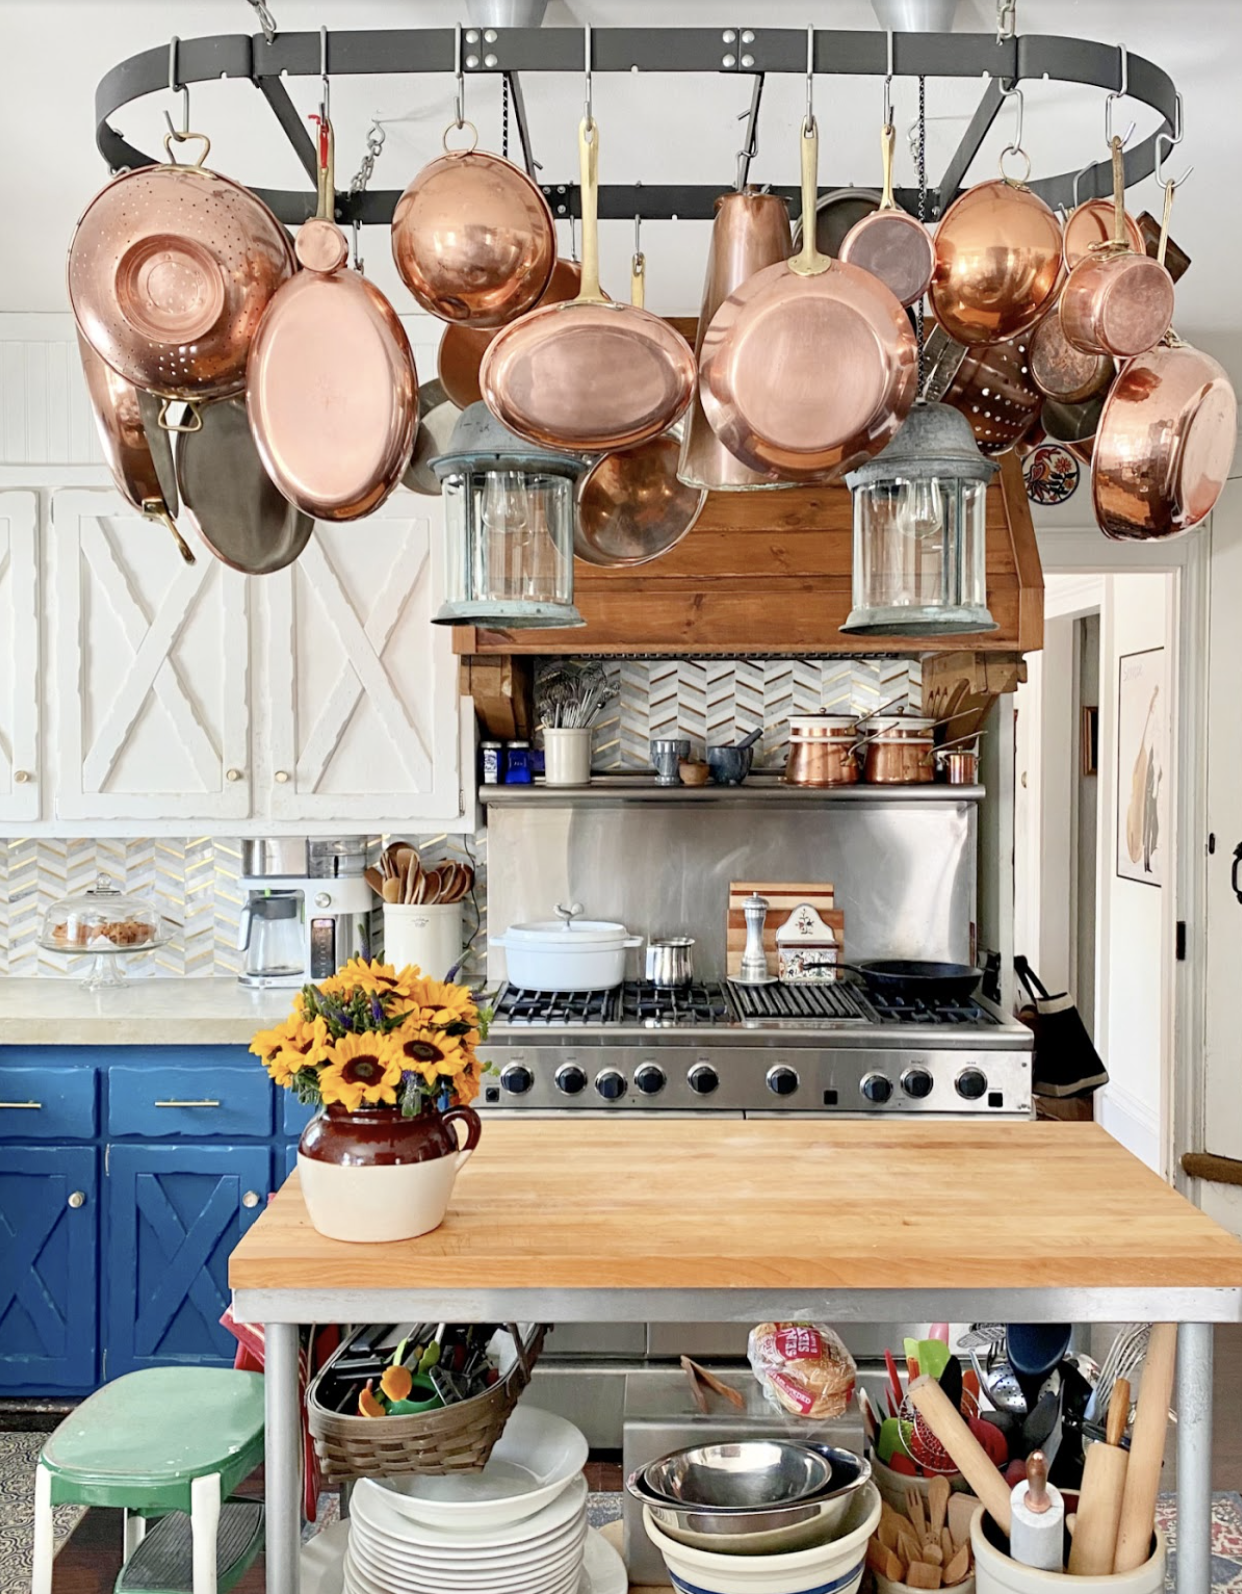 Farmhouse Kitchen Copper Pot Display kellyelko.com